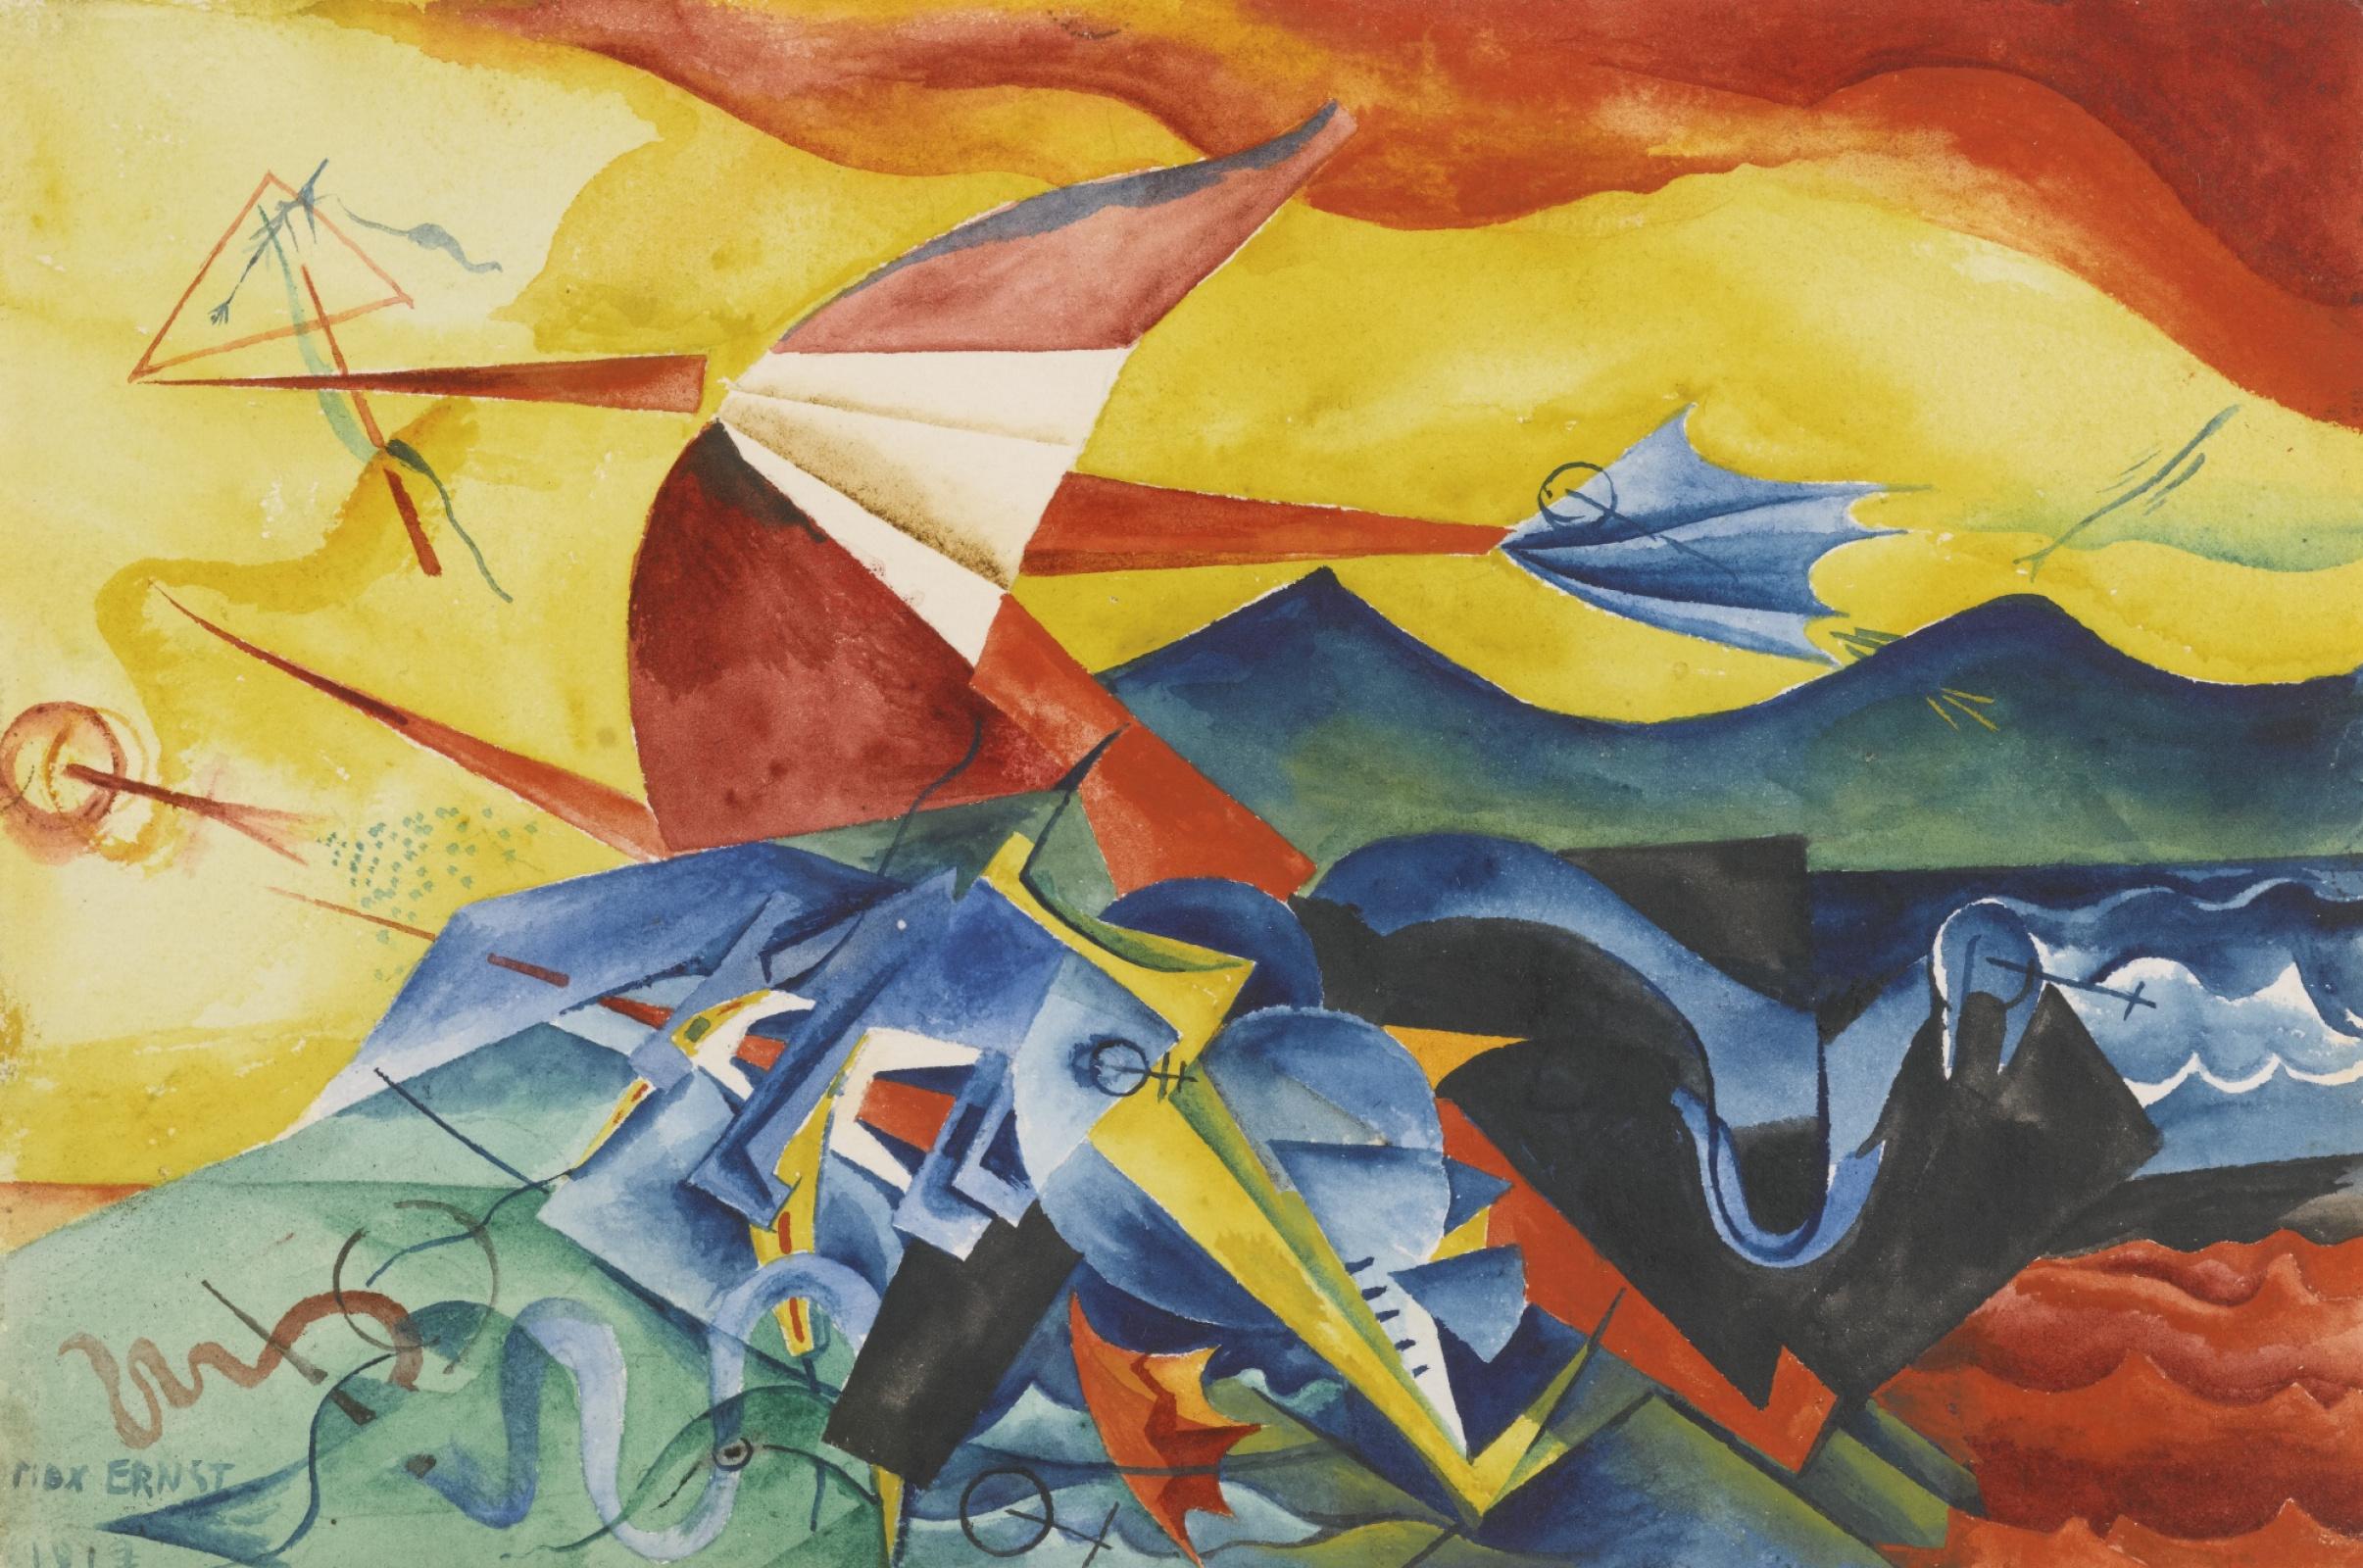 Max Ernst. Composition